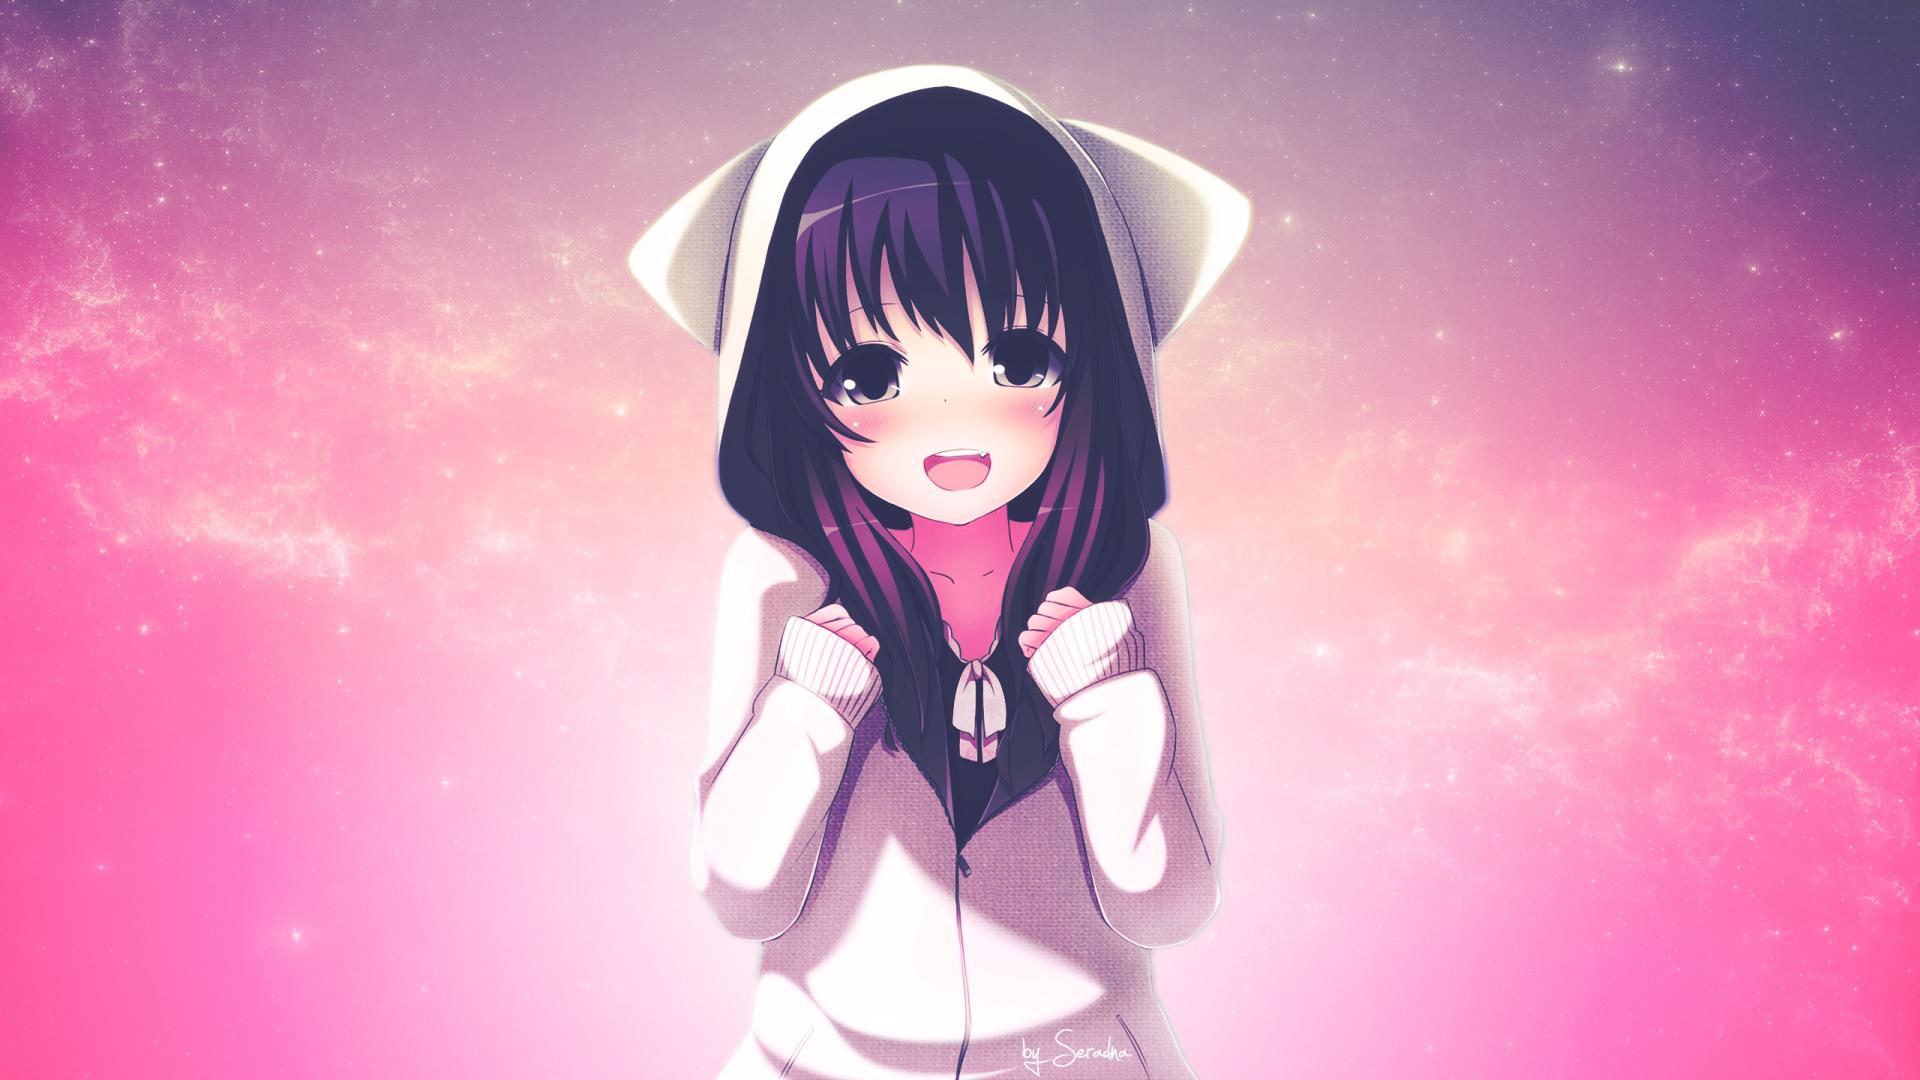 Anime - Unknown  Anime Girl Wallpaper